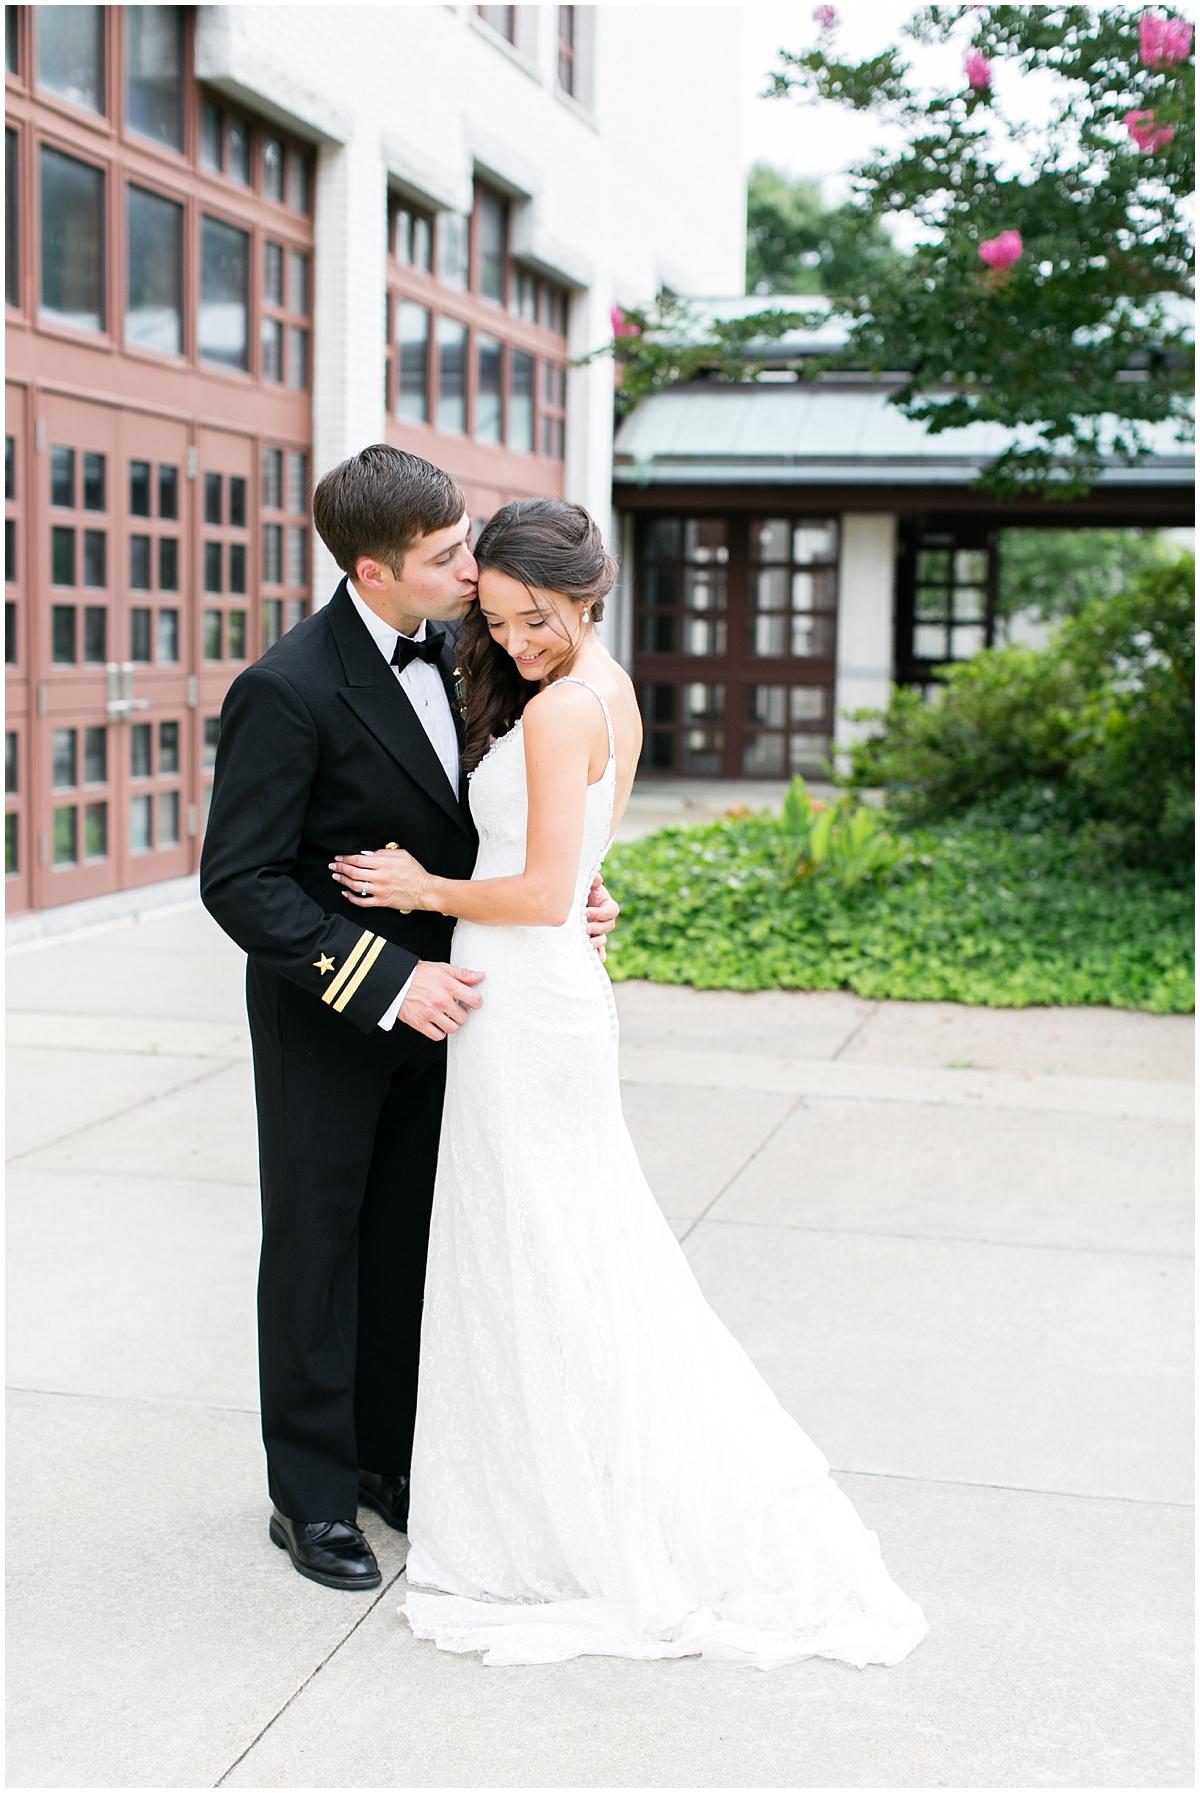 musuem of contemporary art wedding, MOCA wedding, virginia beach wedding bride and groom portraits